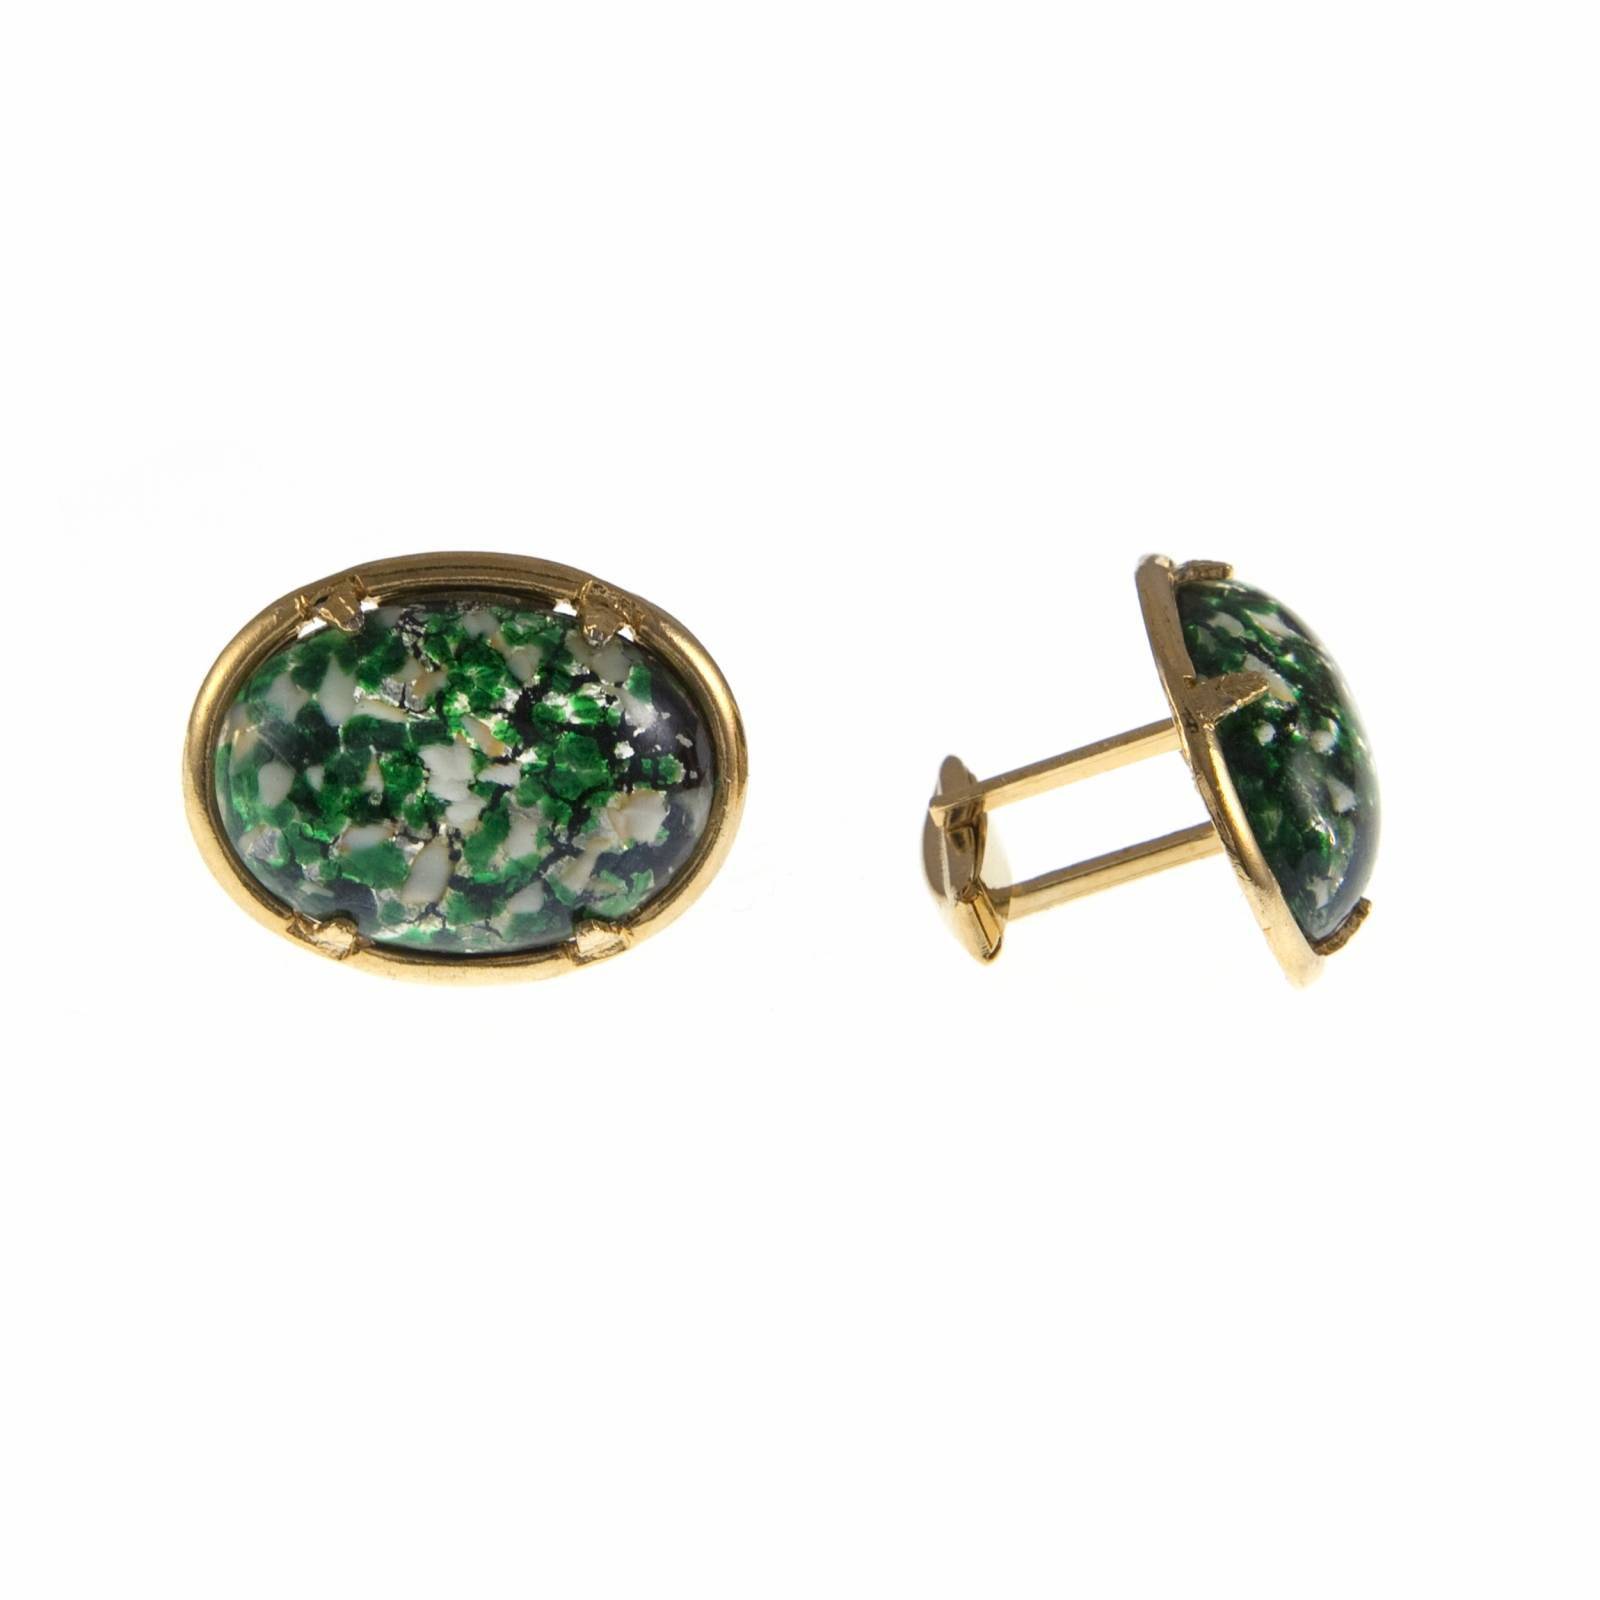 Vintage 1950s Oval Green Mottled Glass  Cufflinks